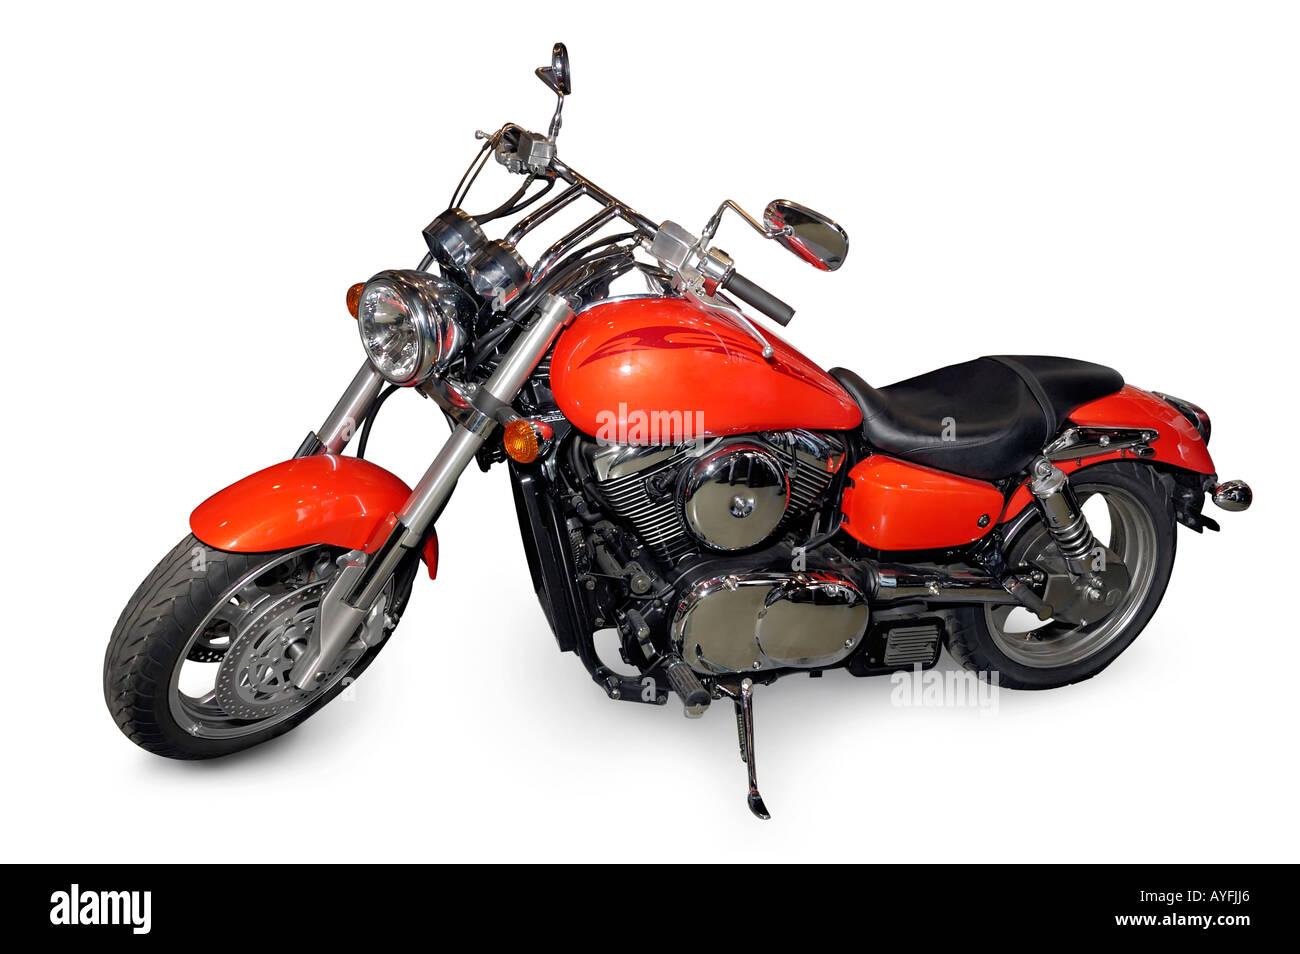 Moto Kawasaki Rouge Banque Dimages Photo Stock 9768101 Alamy